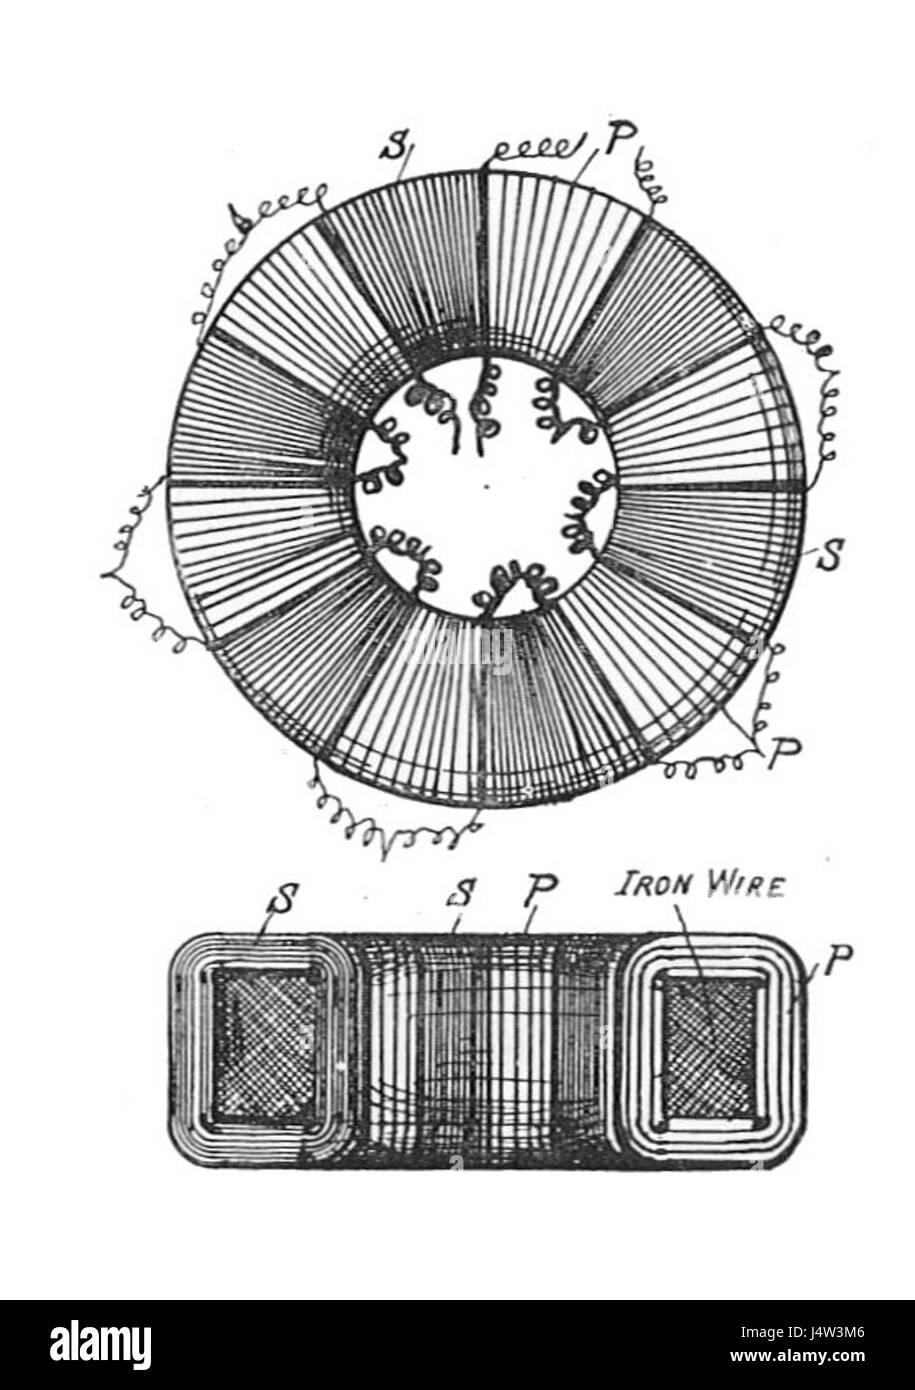 hight resolution of toroidal core transformer rankin kennedy electrical installations vol ii 1909